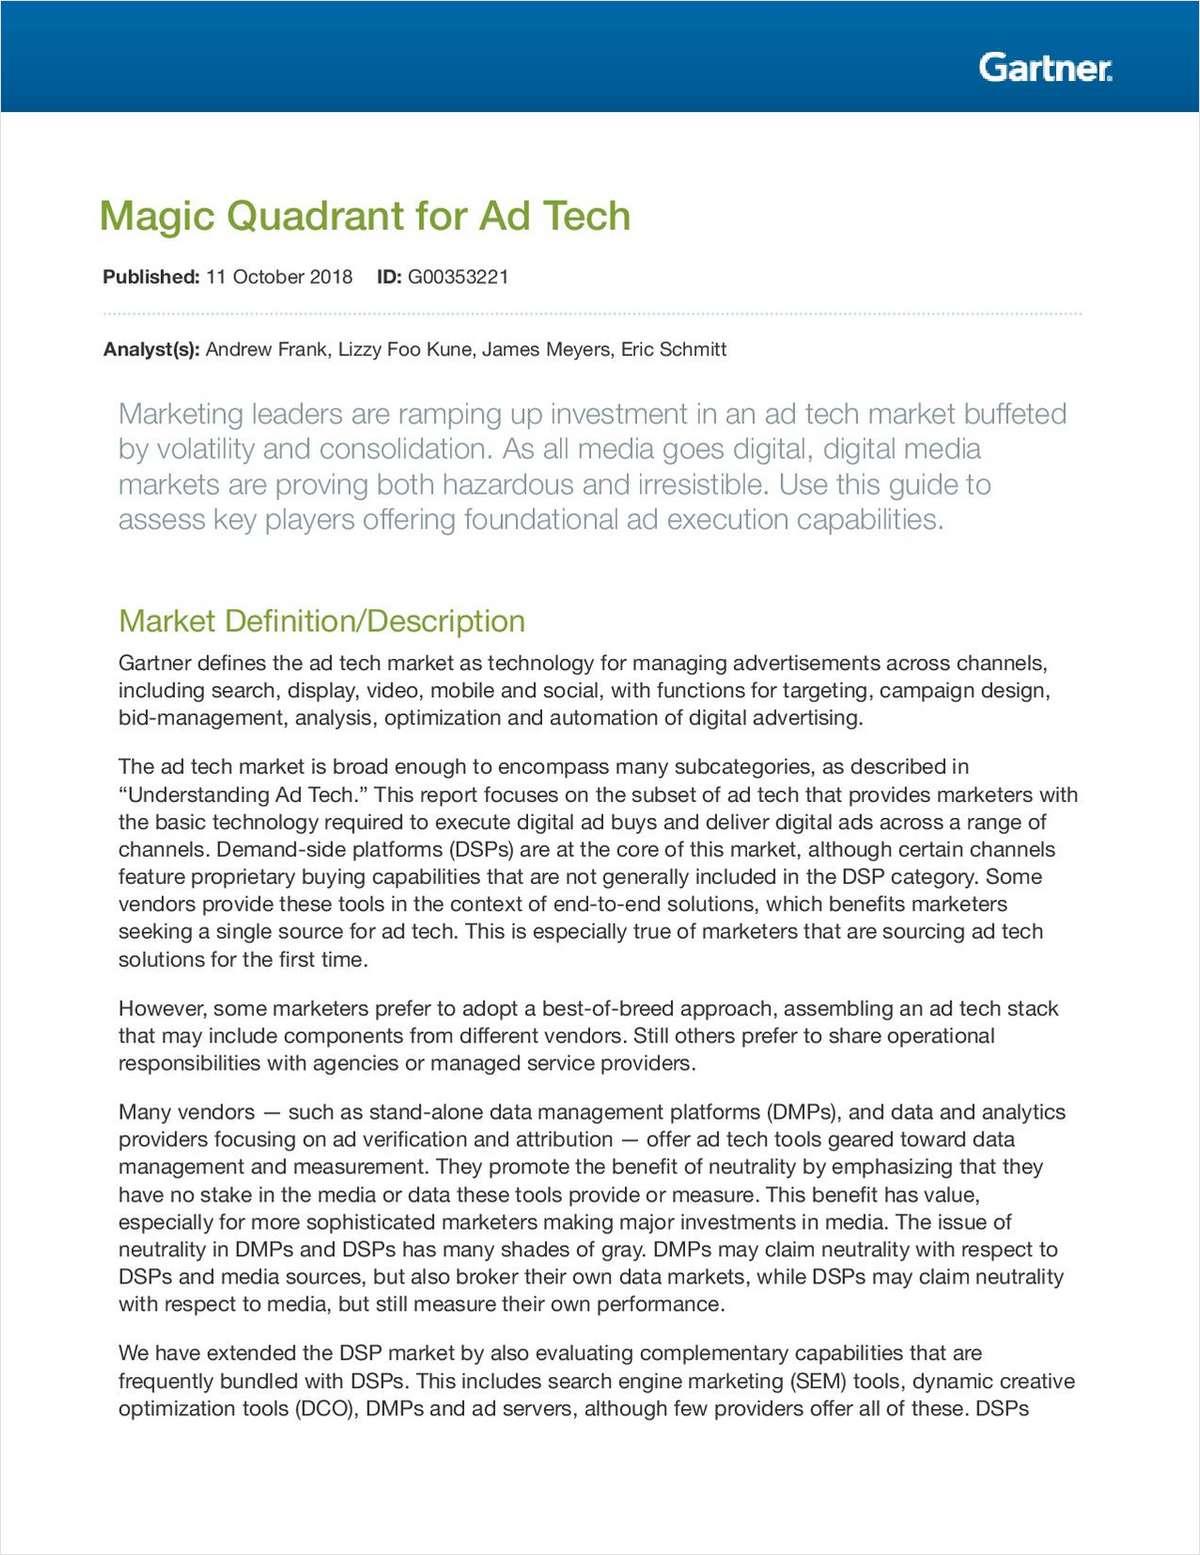 2018 Magic Quadrant for Ad Tech